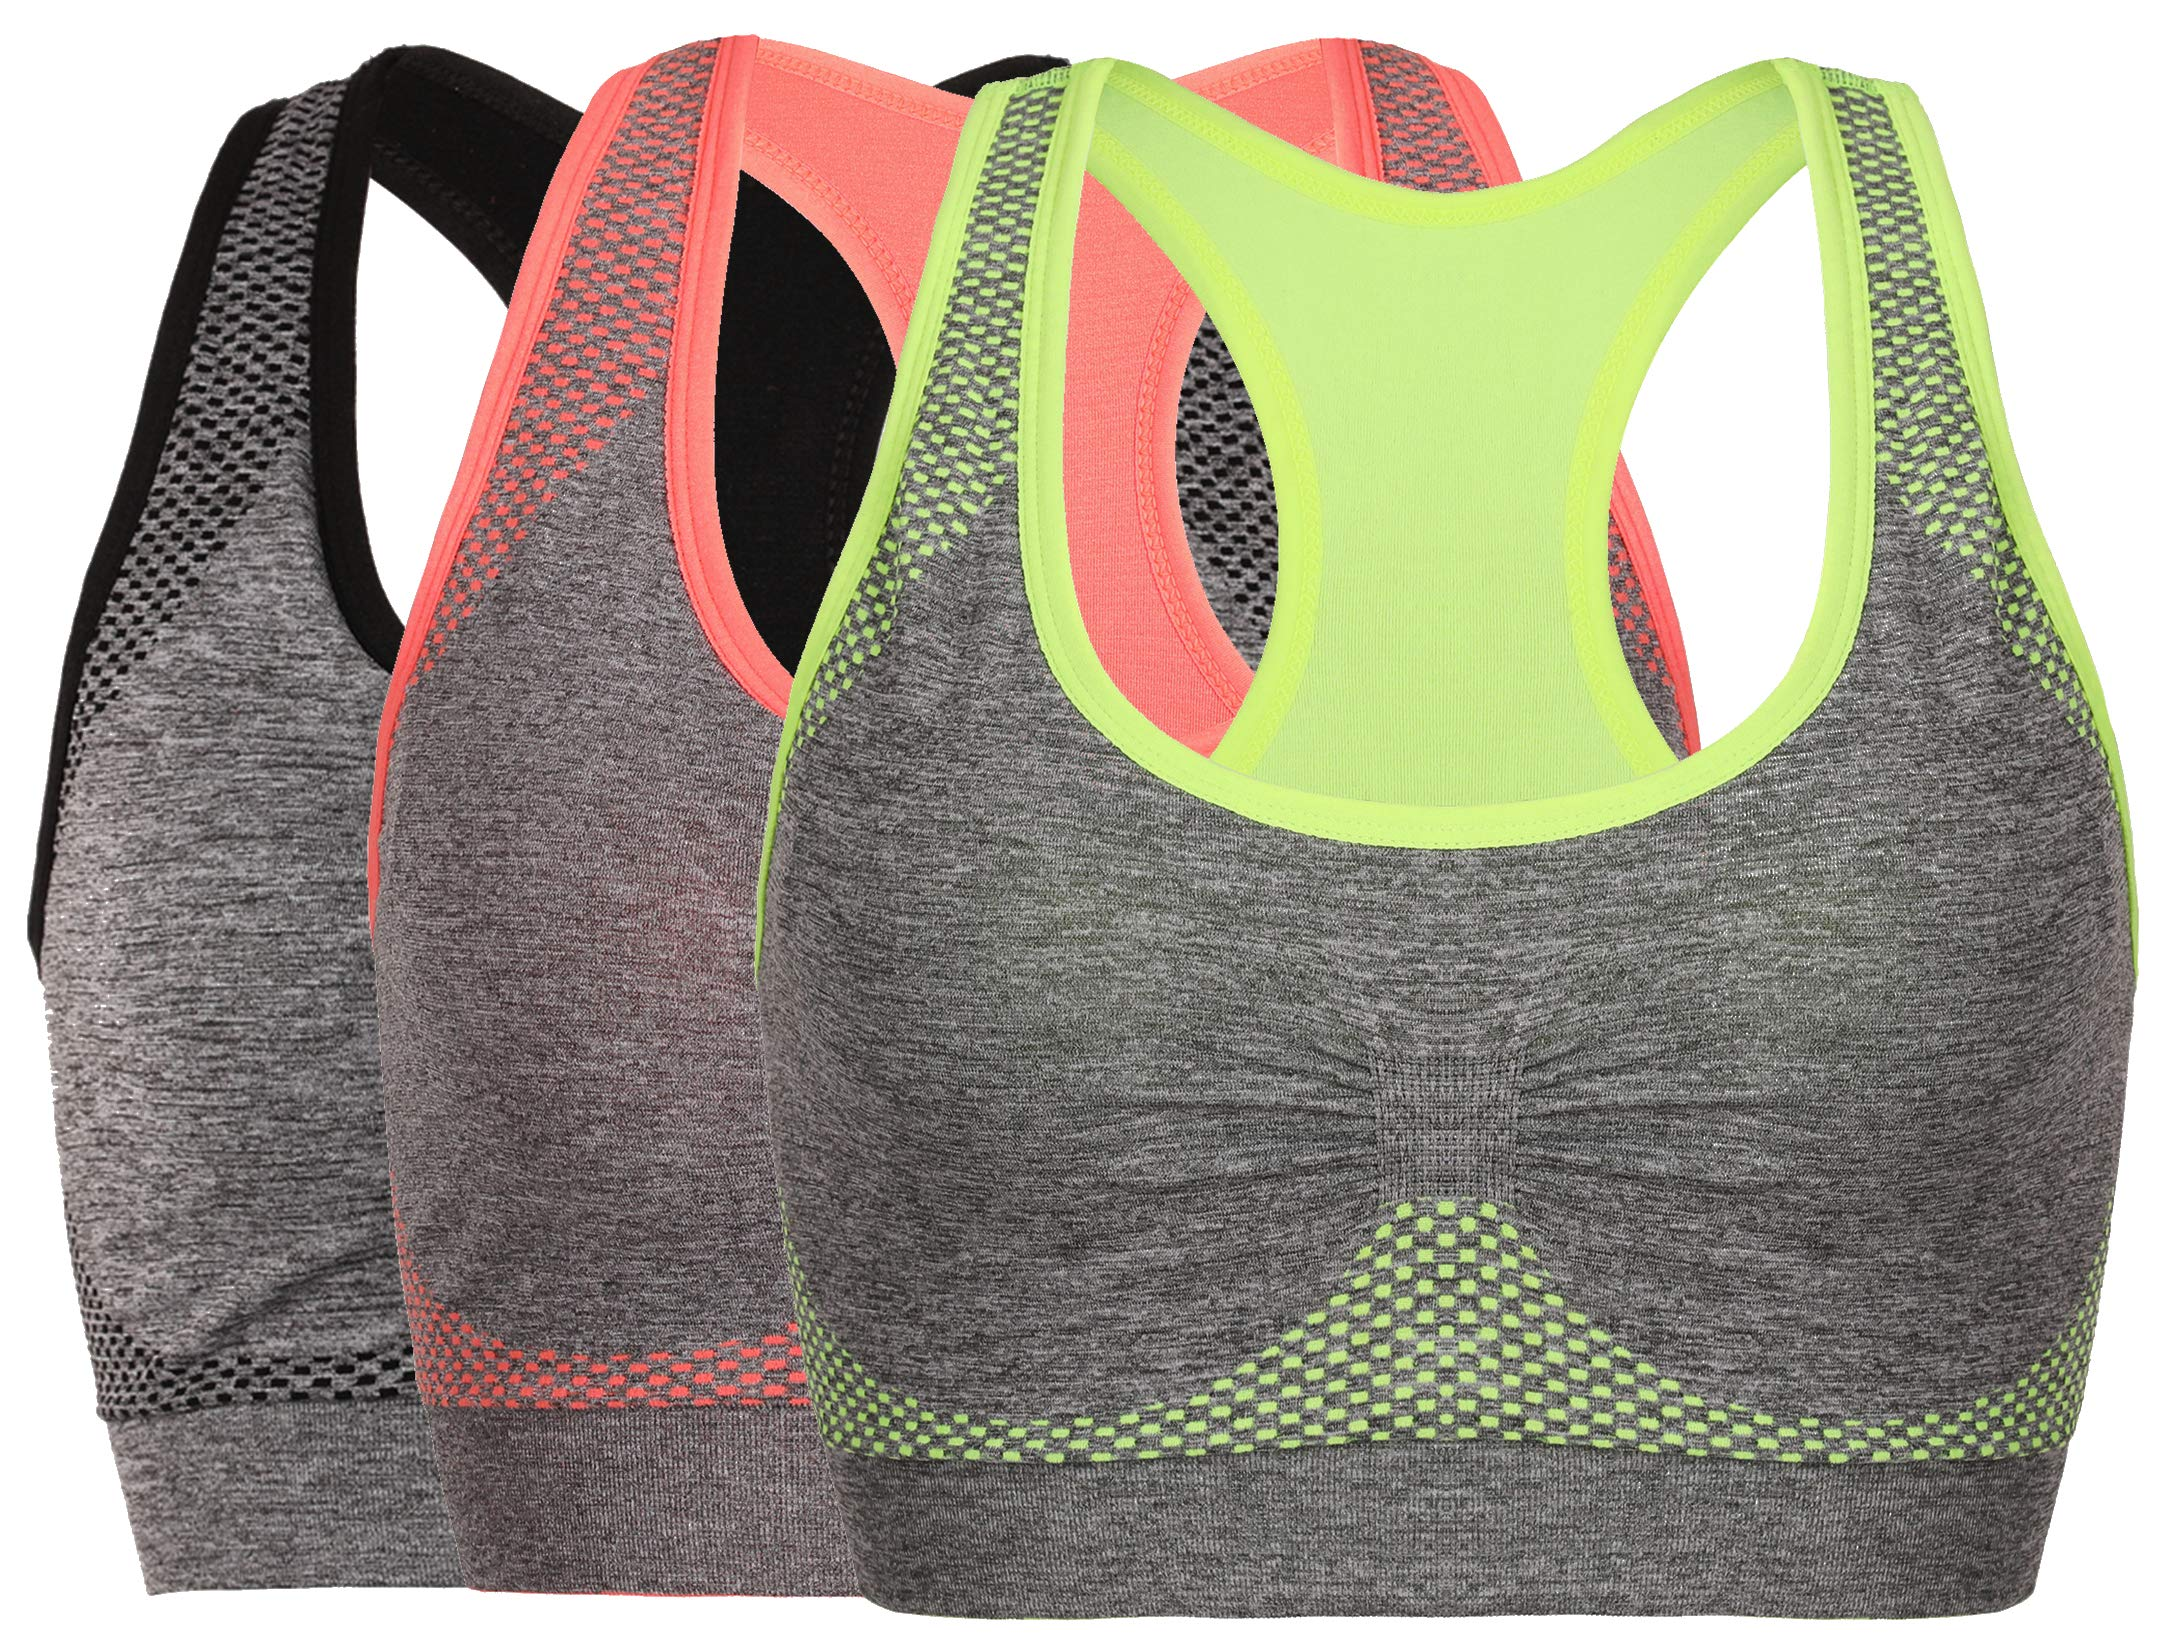 Vermilion Bird Women's Seamless Sports Bra High Impact Pocket Yoga Bras (30A 30B 30C 30D 32A 32B 32C, 3 Pack:Grey Green Orange)